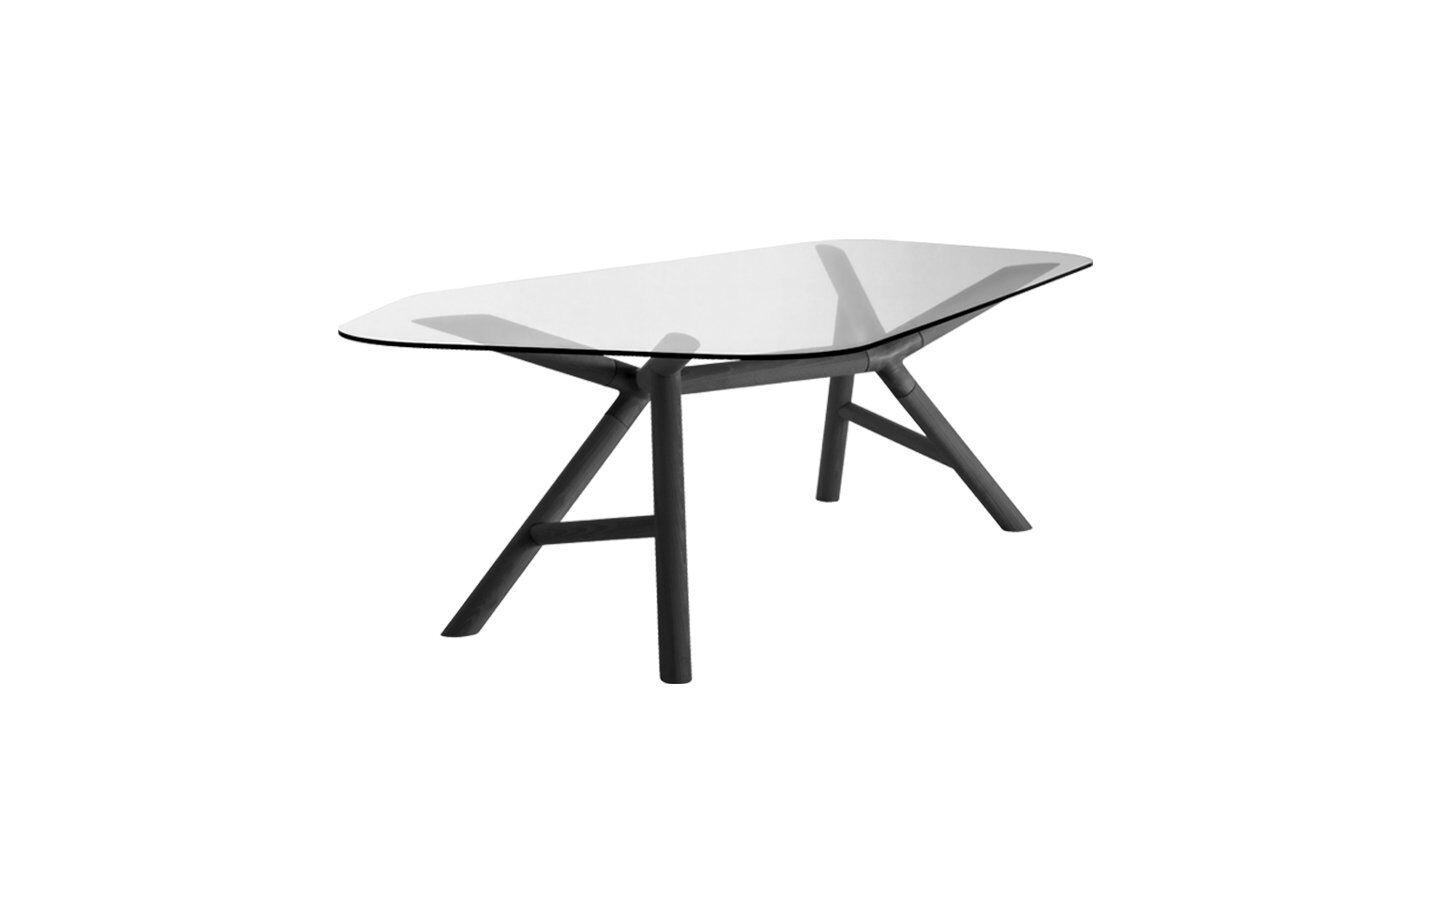 Miniforms Otto Table by Miniforms 200 x 118 x 74 cm Europe Gray Glass Black Ash Wood